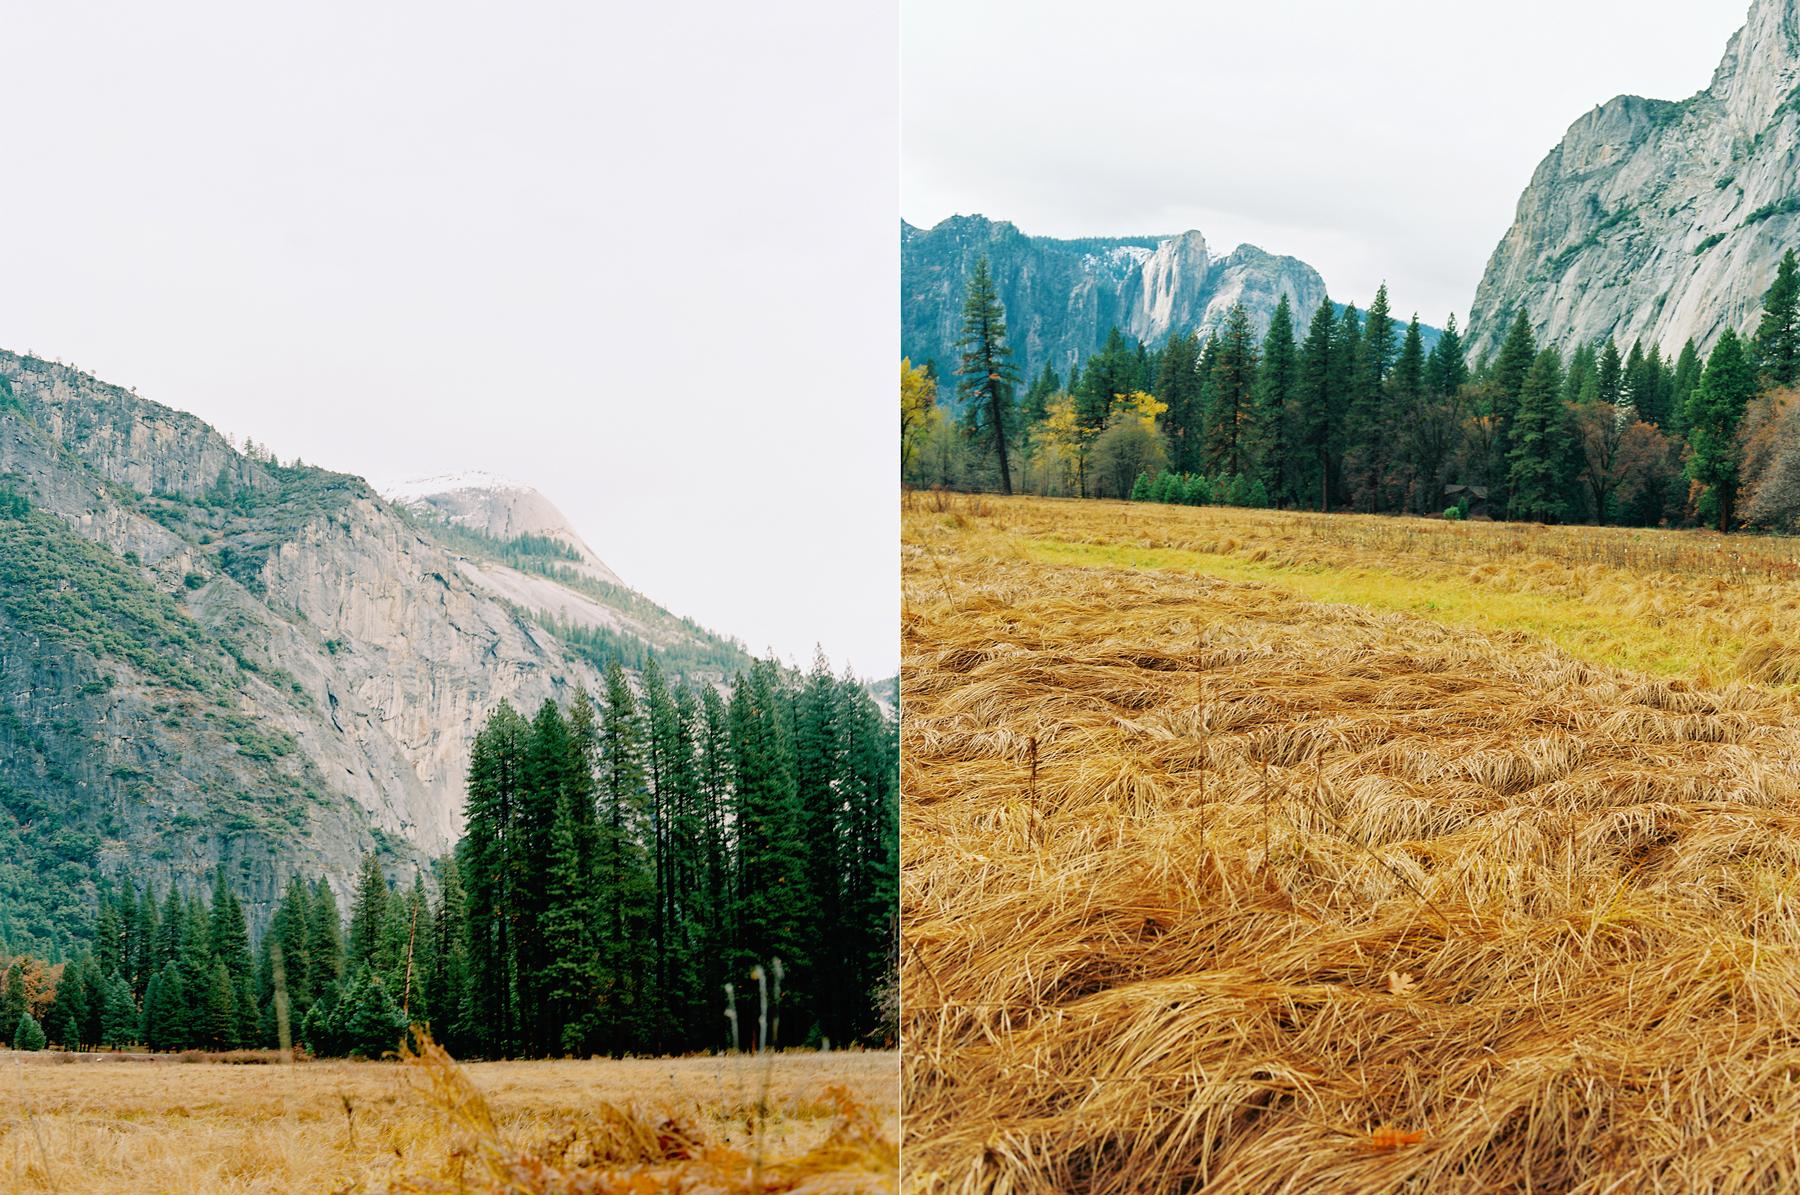 01sRGB-Inna-Kostukovsky-Yosemite1.jpg